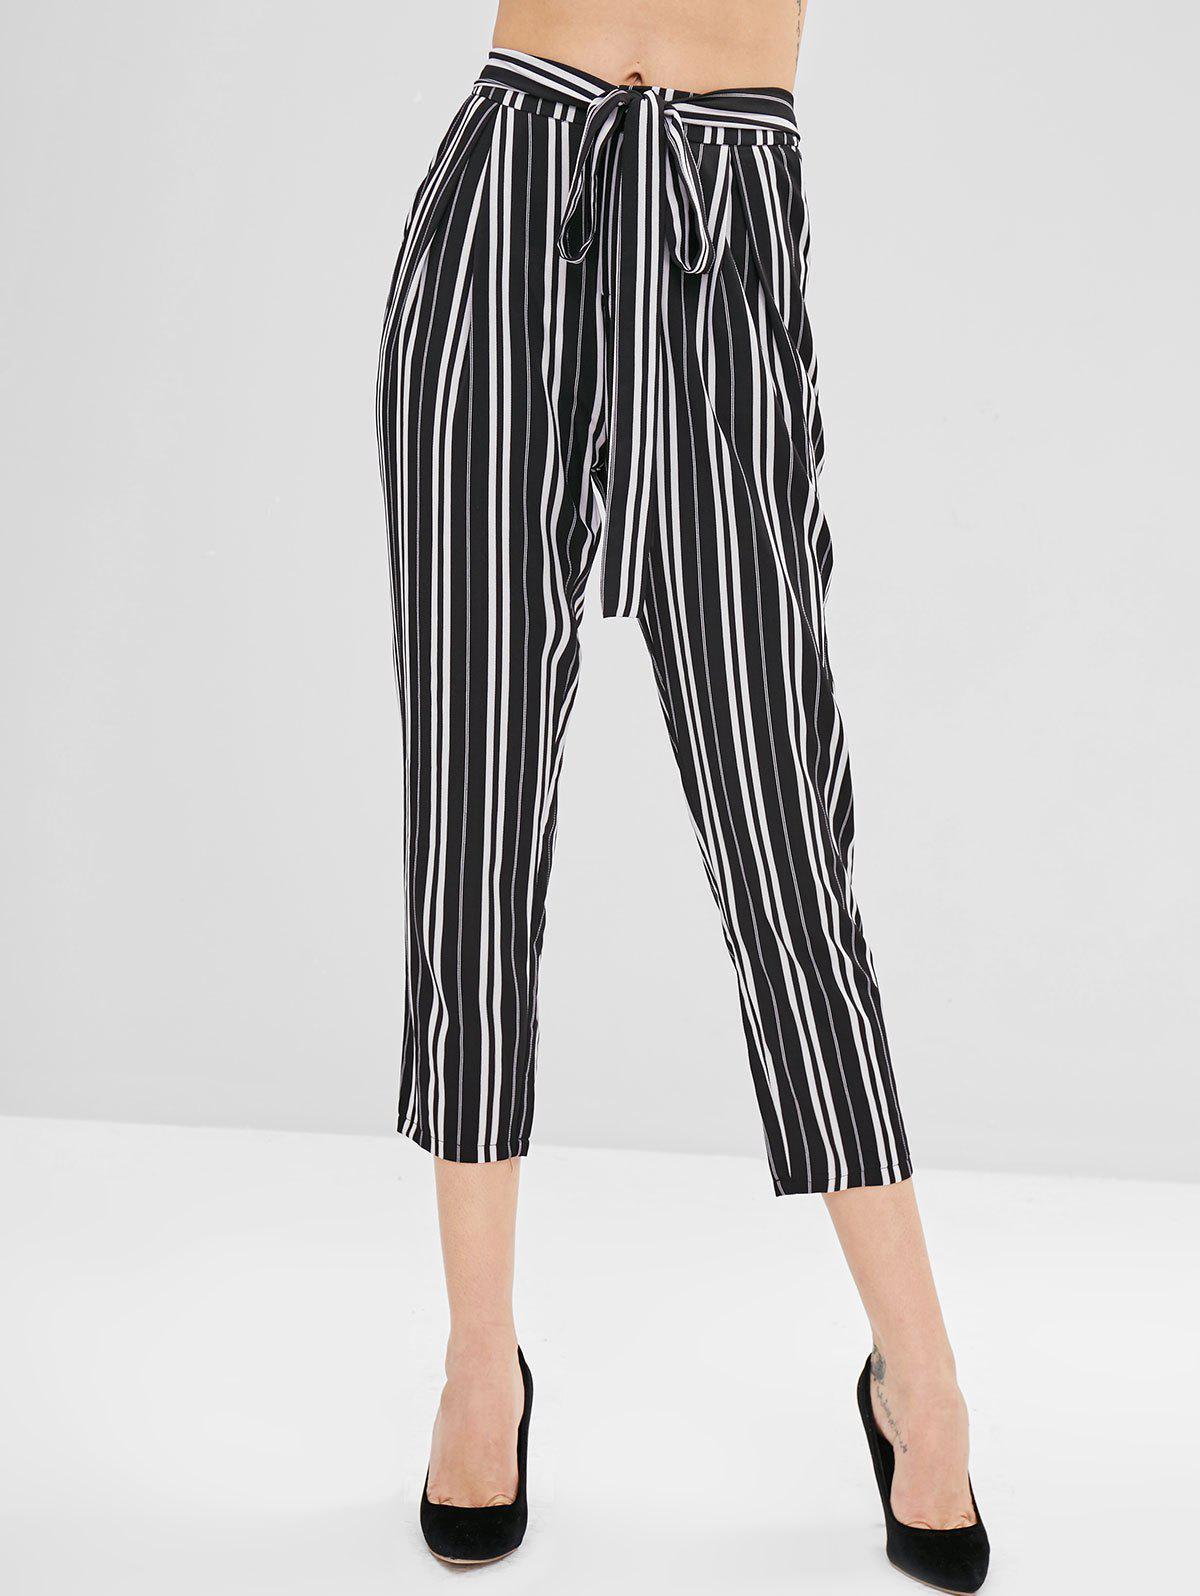 ZAFUL Striped High Waisted Tapered Pants, Multi